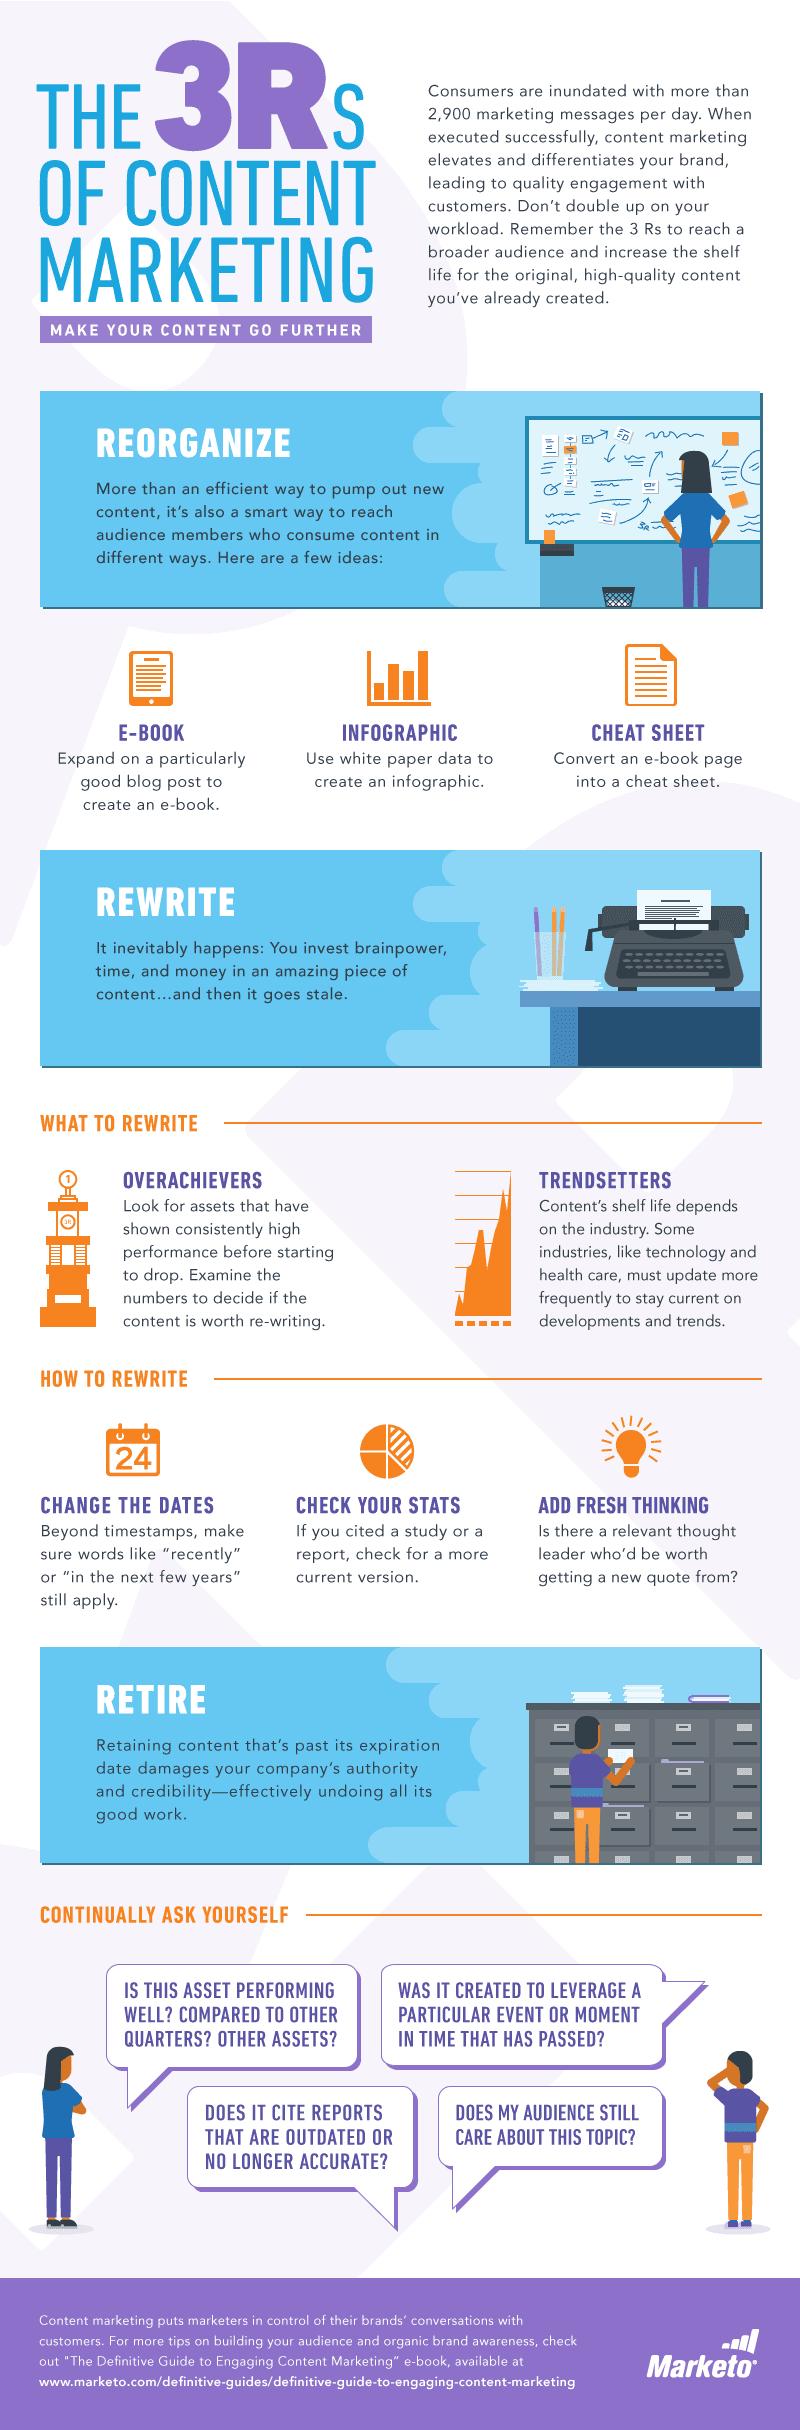 The 3 r's of content marketing: reorganize, retire, rewrite